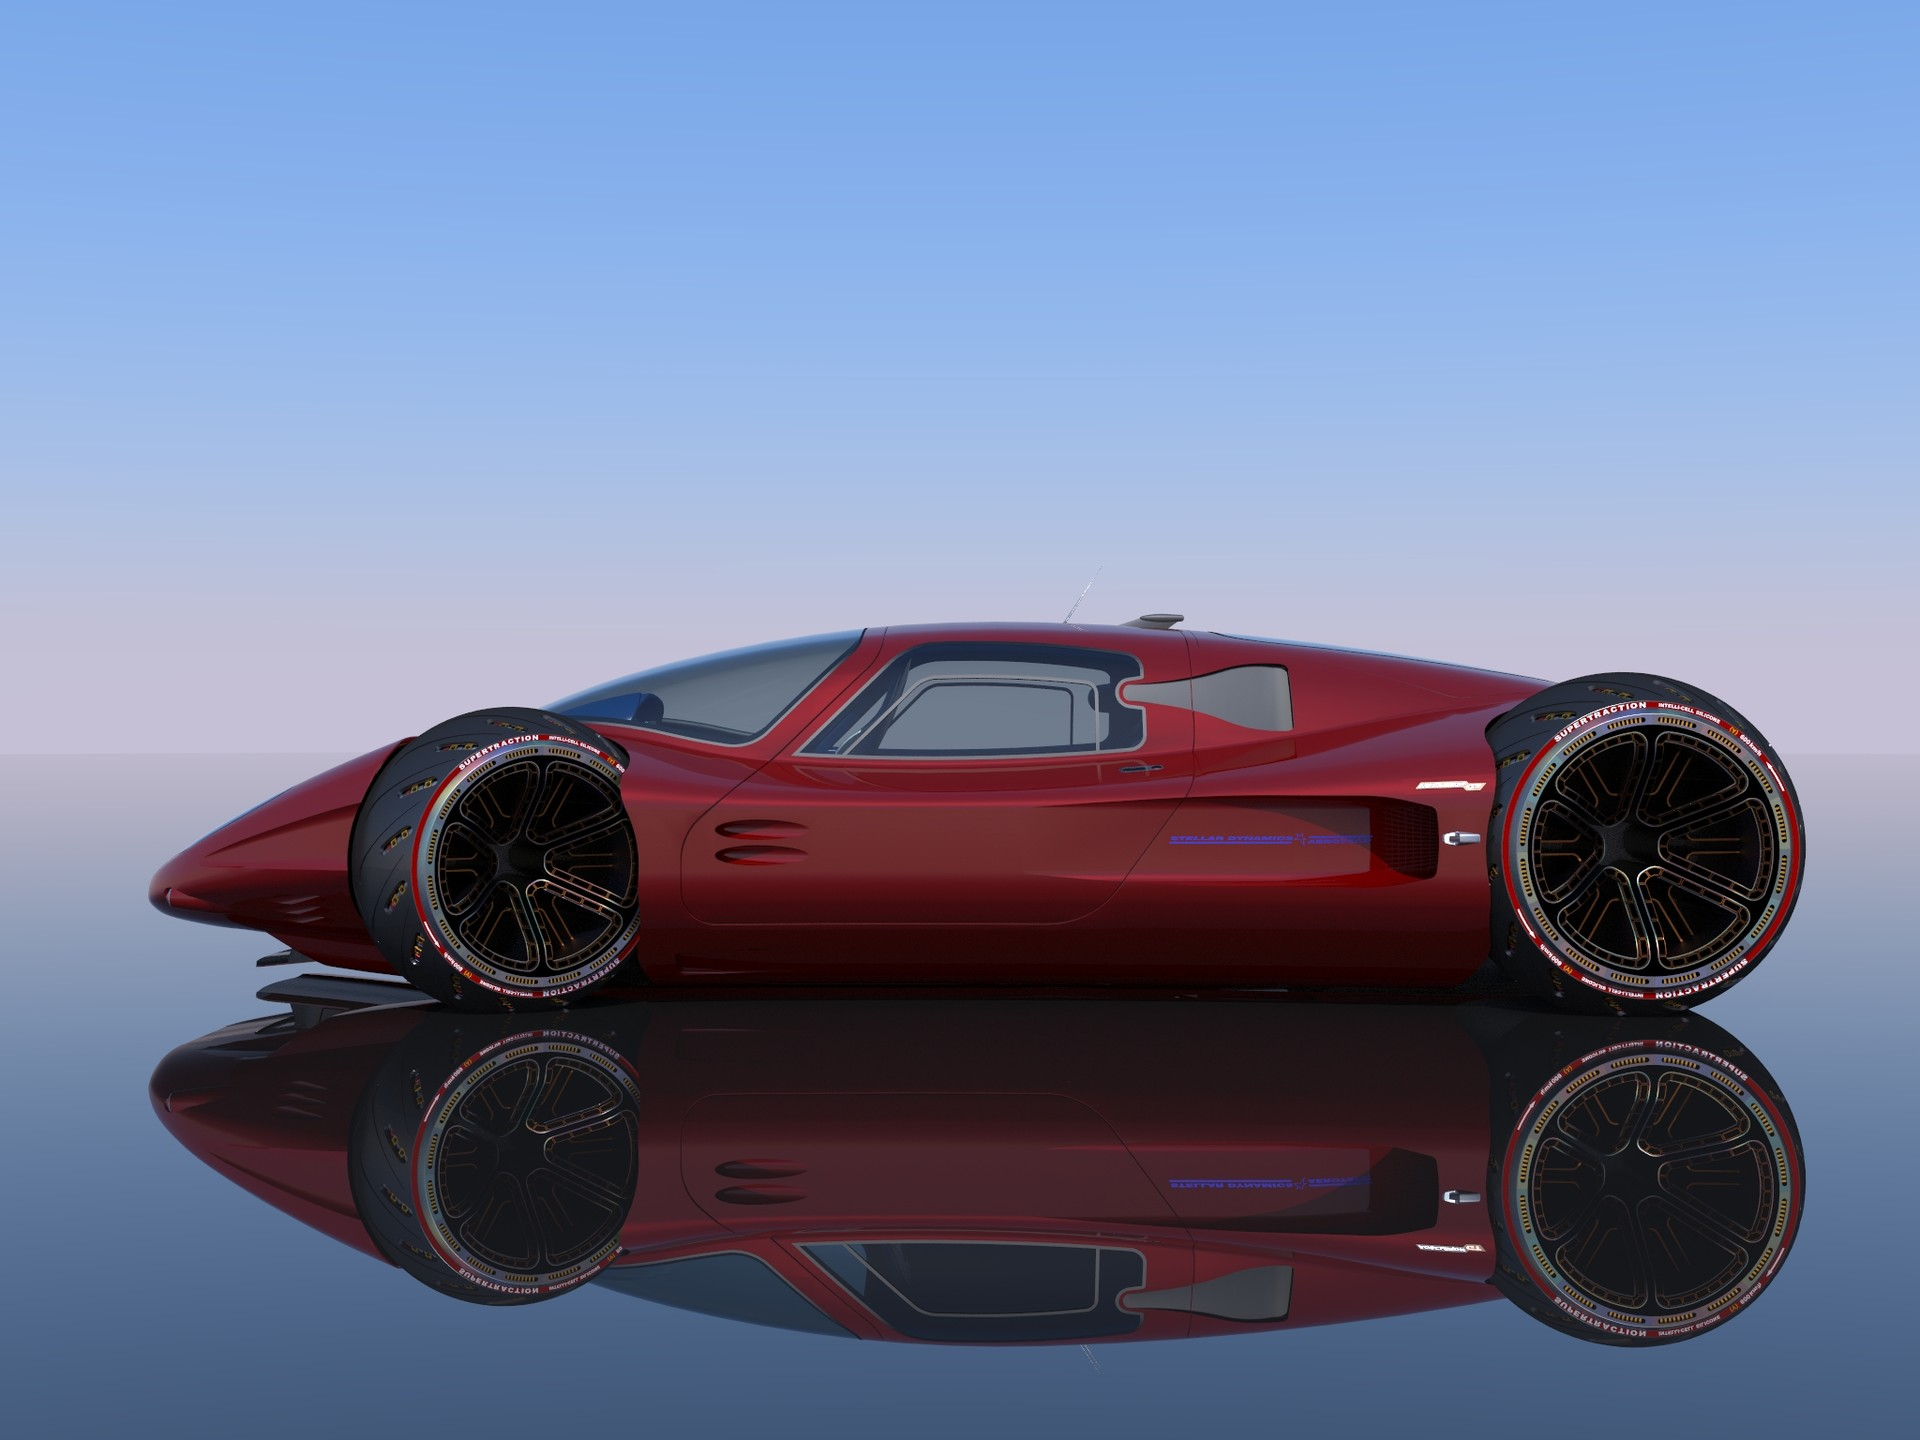 Joachim sverd supercar concept37